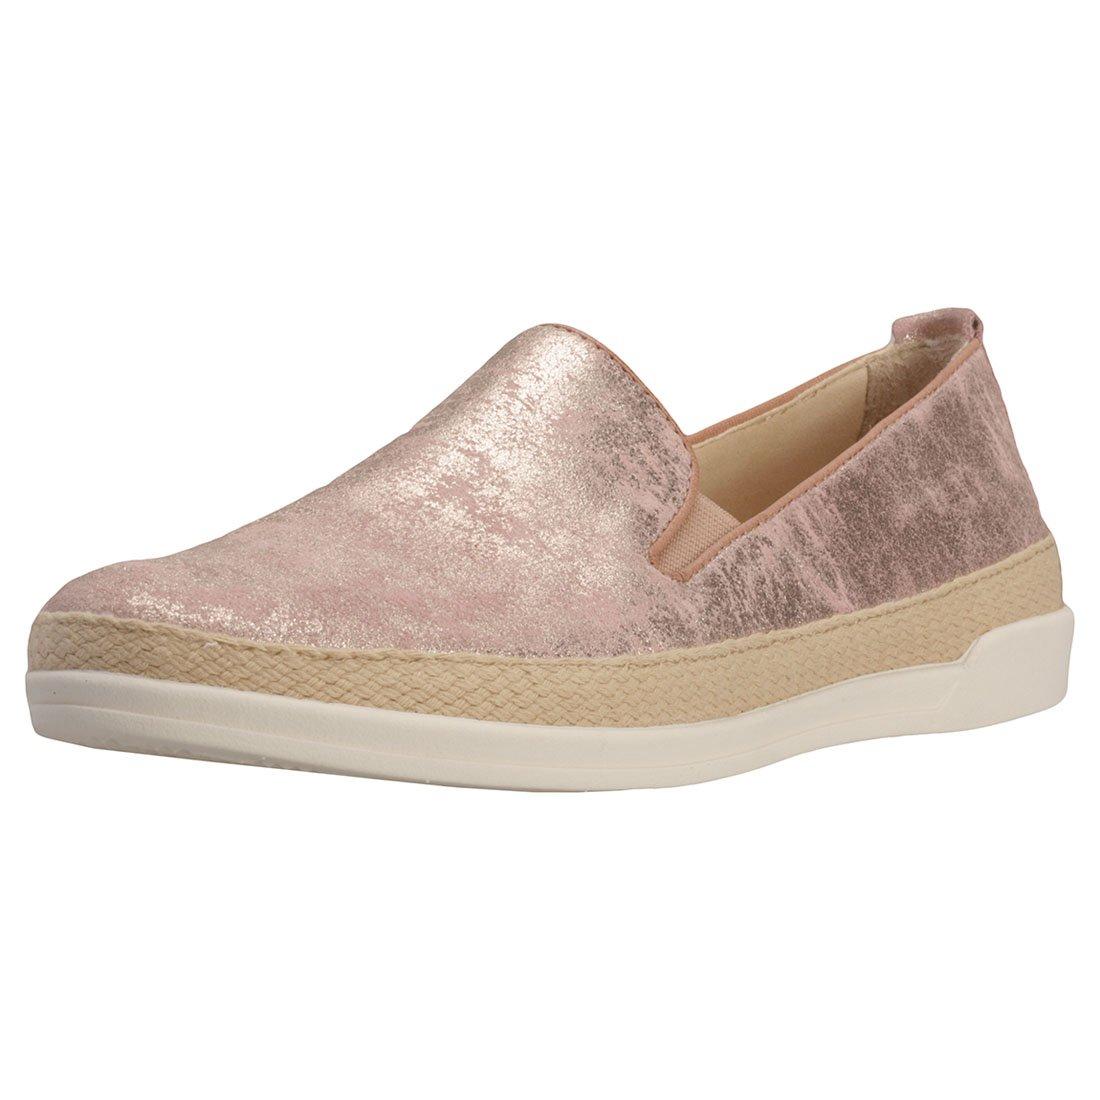 Caprice 9-24201-20 Schuhe Damen Sneaker Halbschuhe Slipper Sneaker Damen Rot 4e941b